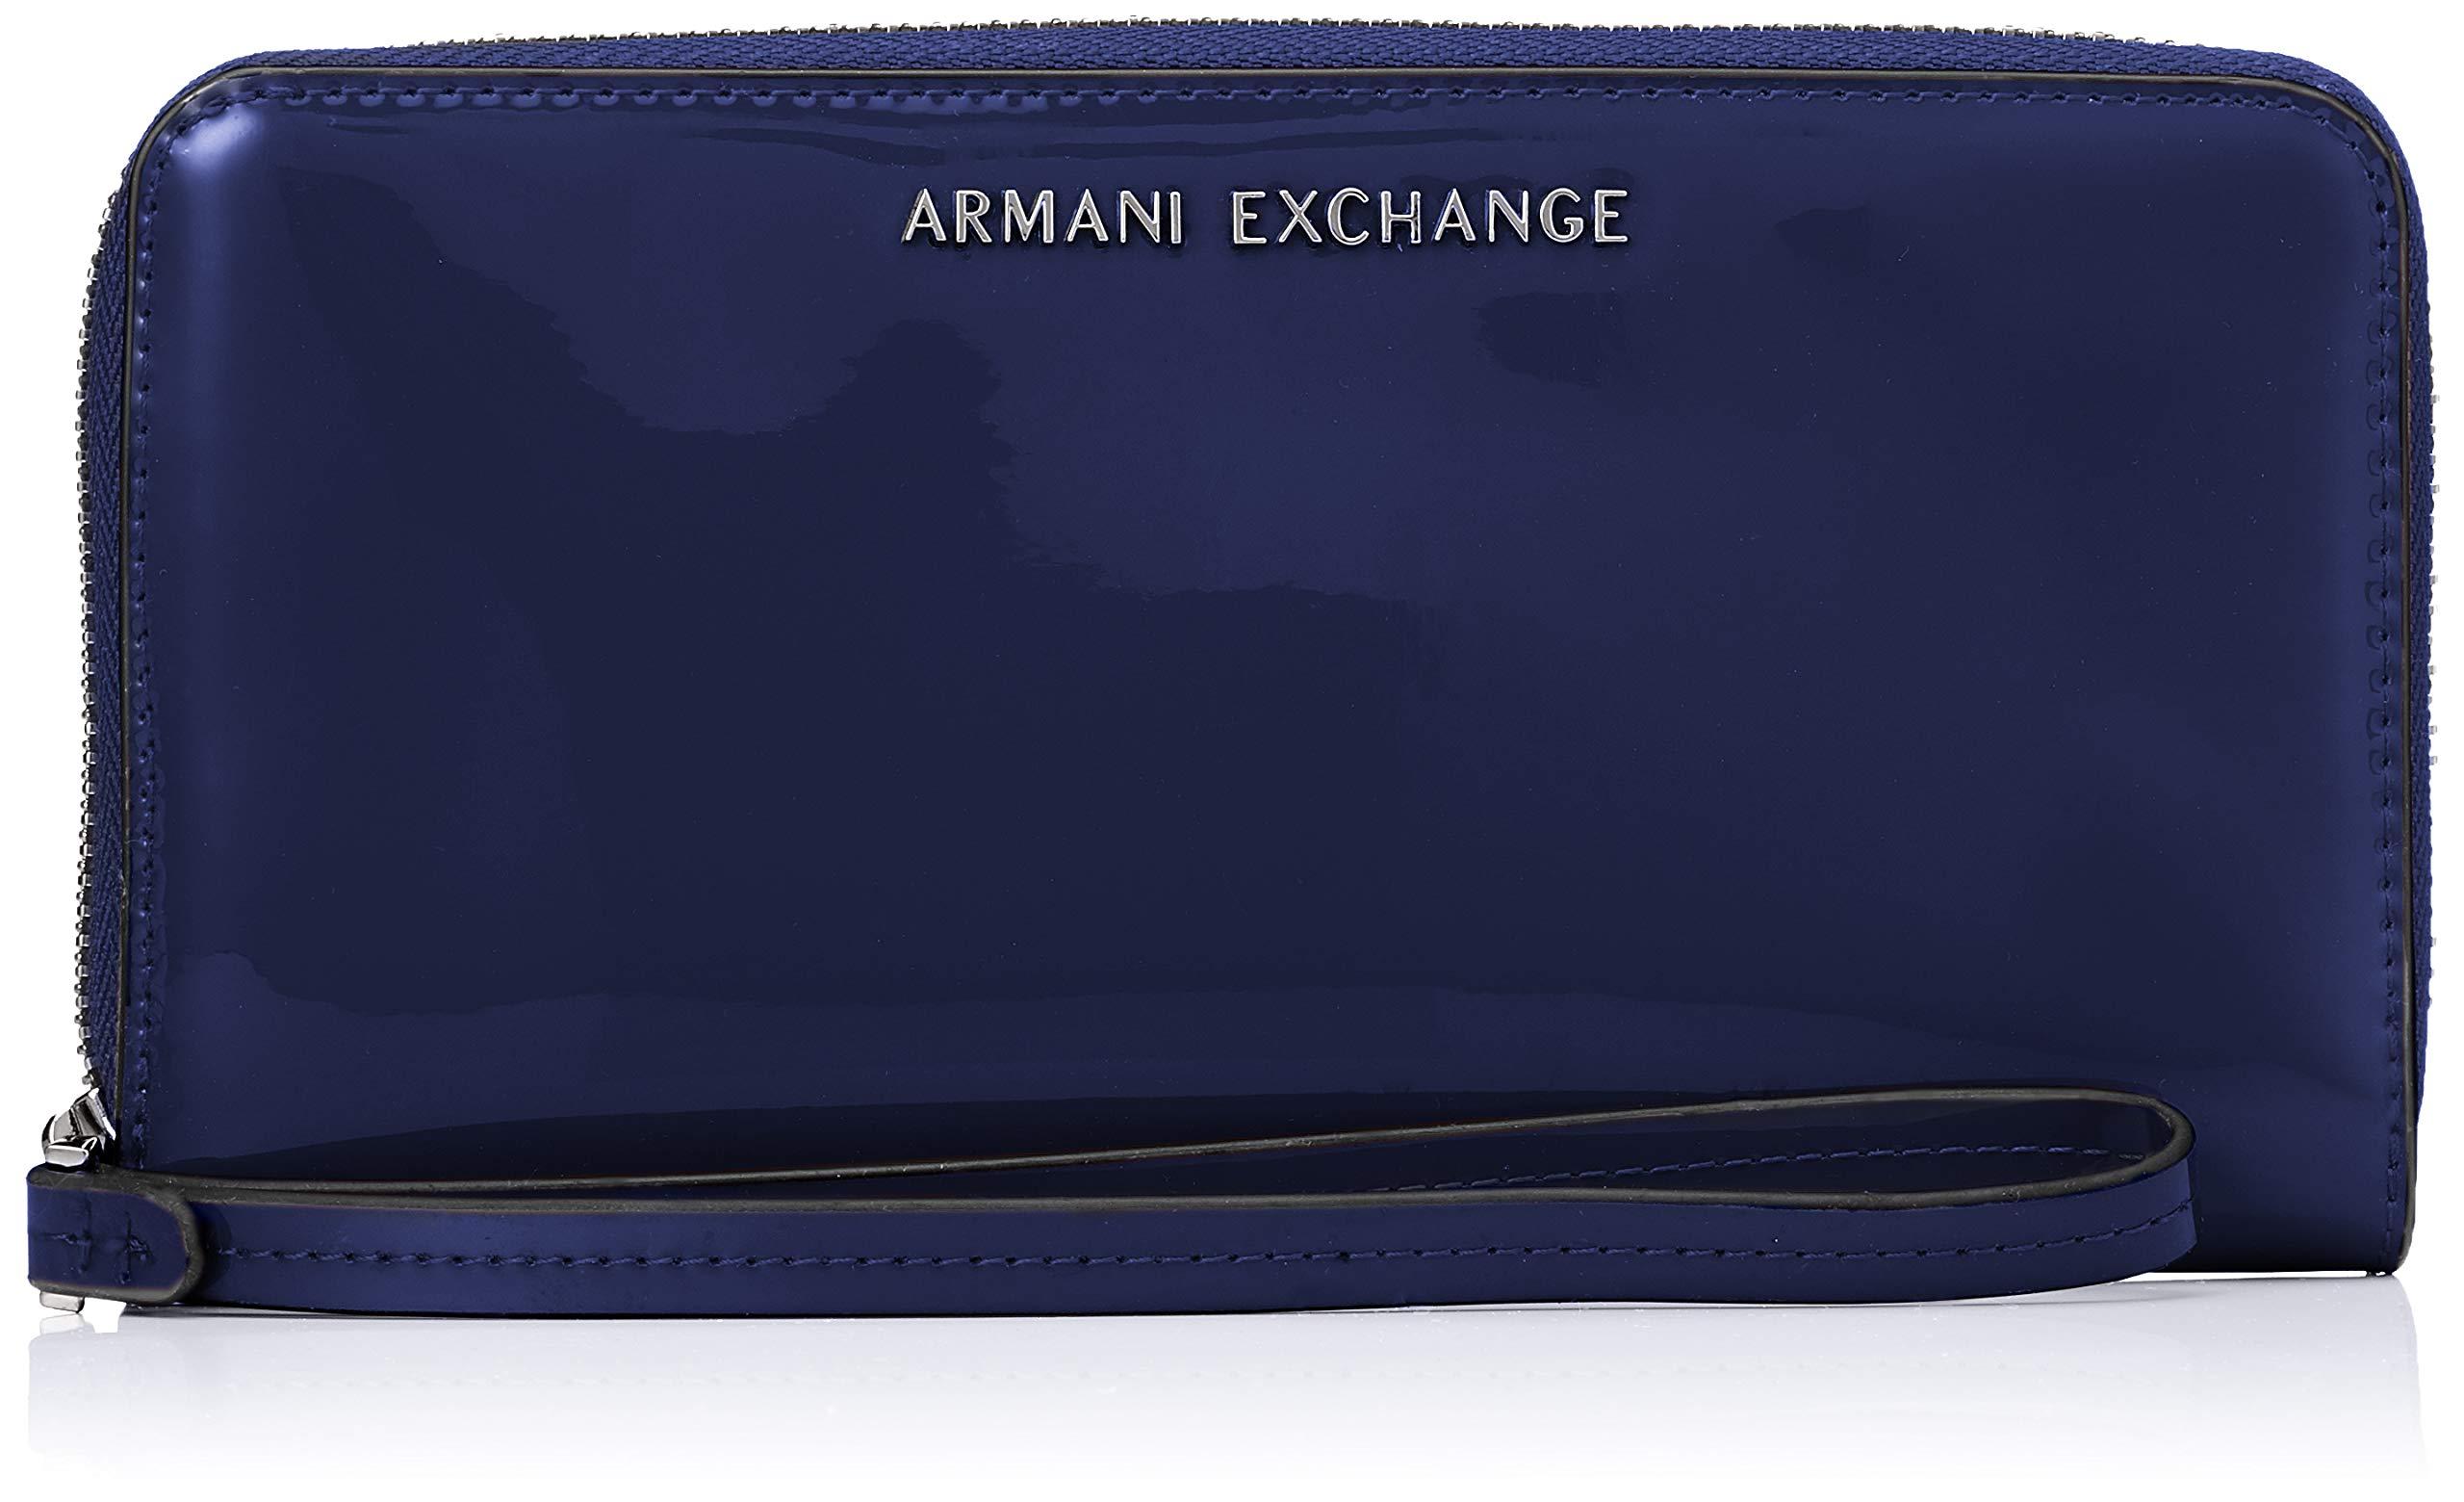 X H Round Fabric T Cmb Exchange ZipSacs FemmeBleunavy10 Menotte 5x2 Armani 5x19 1TlcFJK3